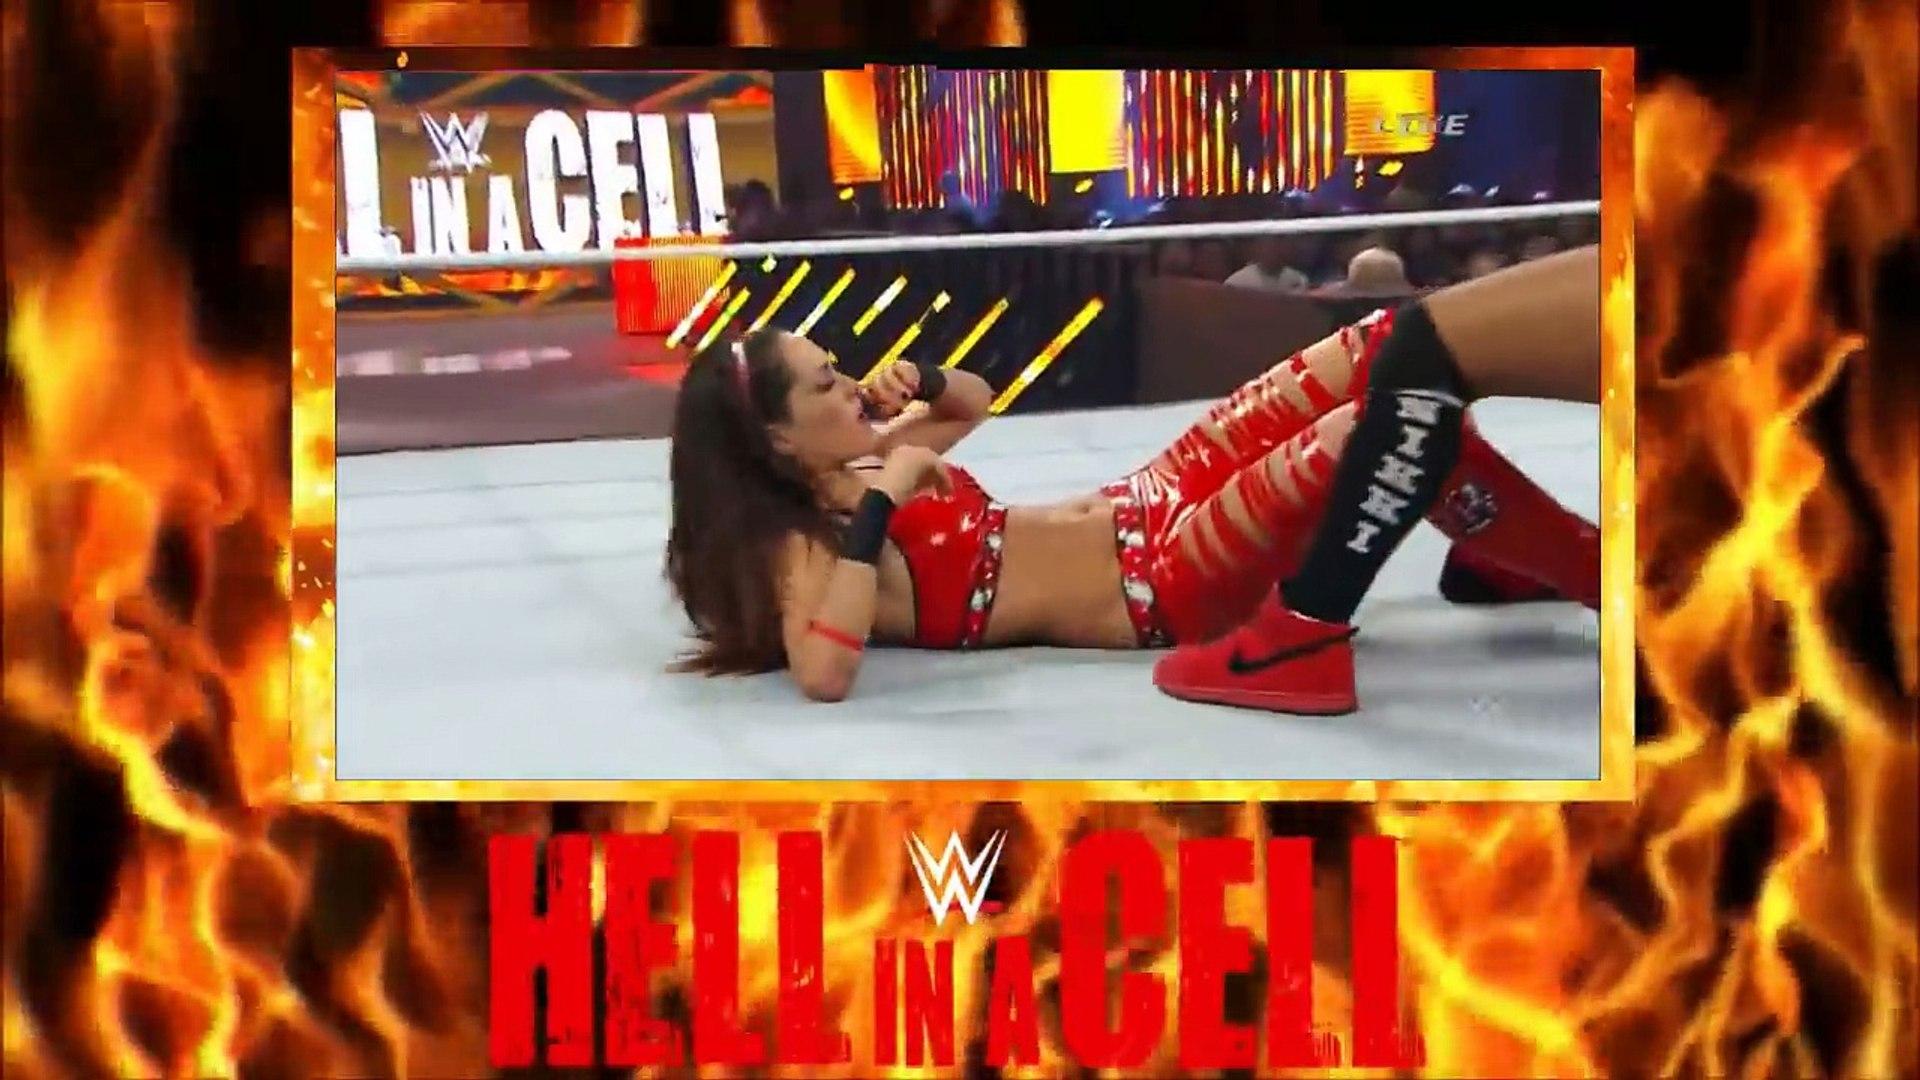 NIKKI BELLA VS BRIE BELLA - HELL IN A CELL MATCH (2014) - WWE Wrestling Diva Sports Female Women Wom